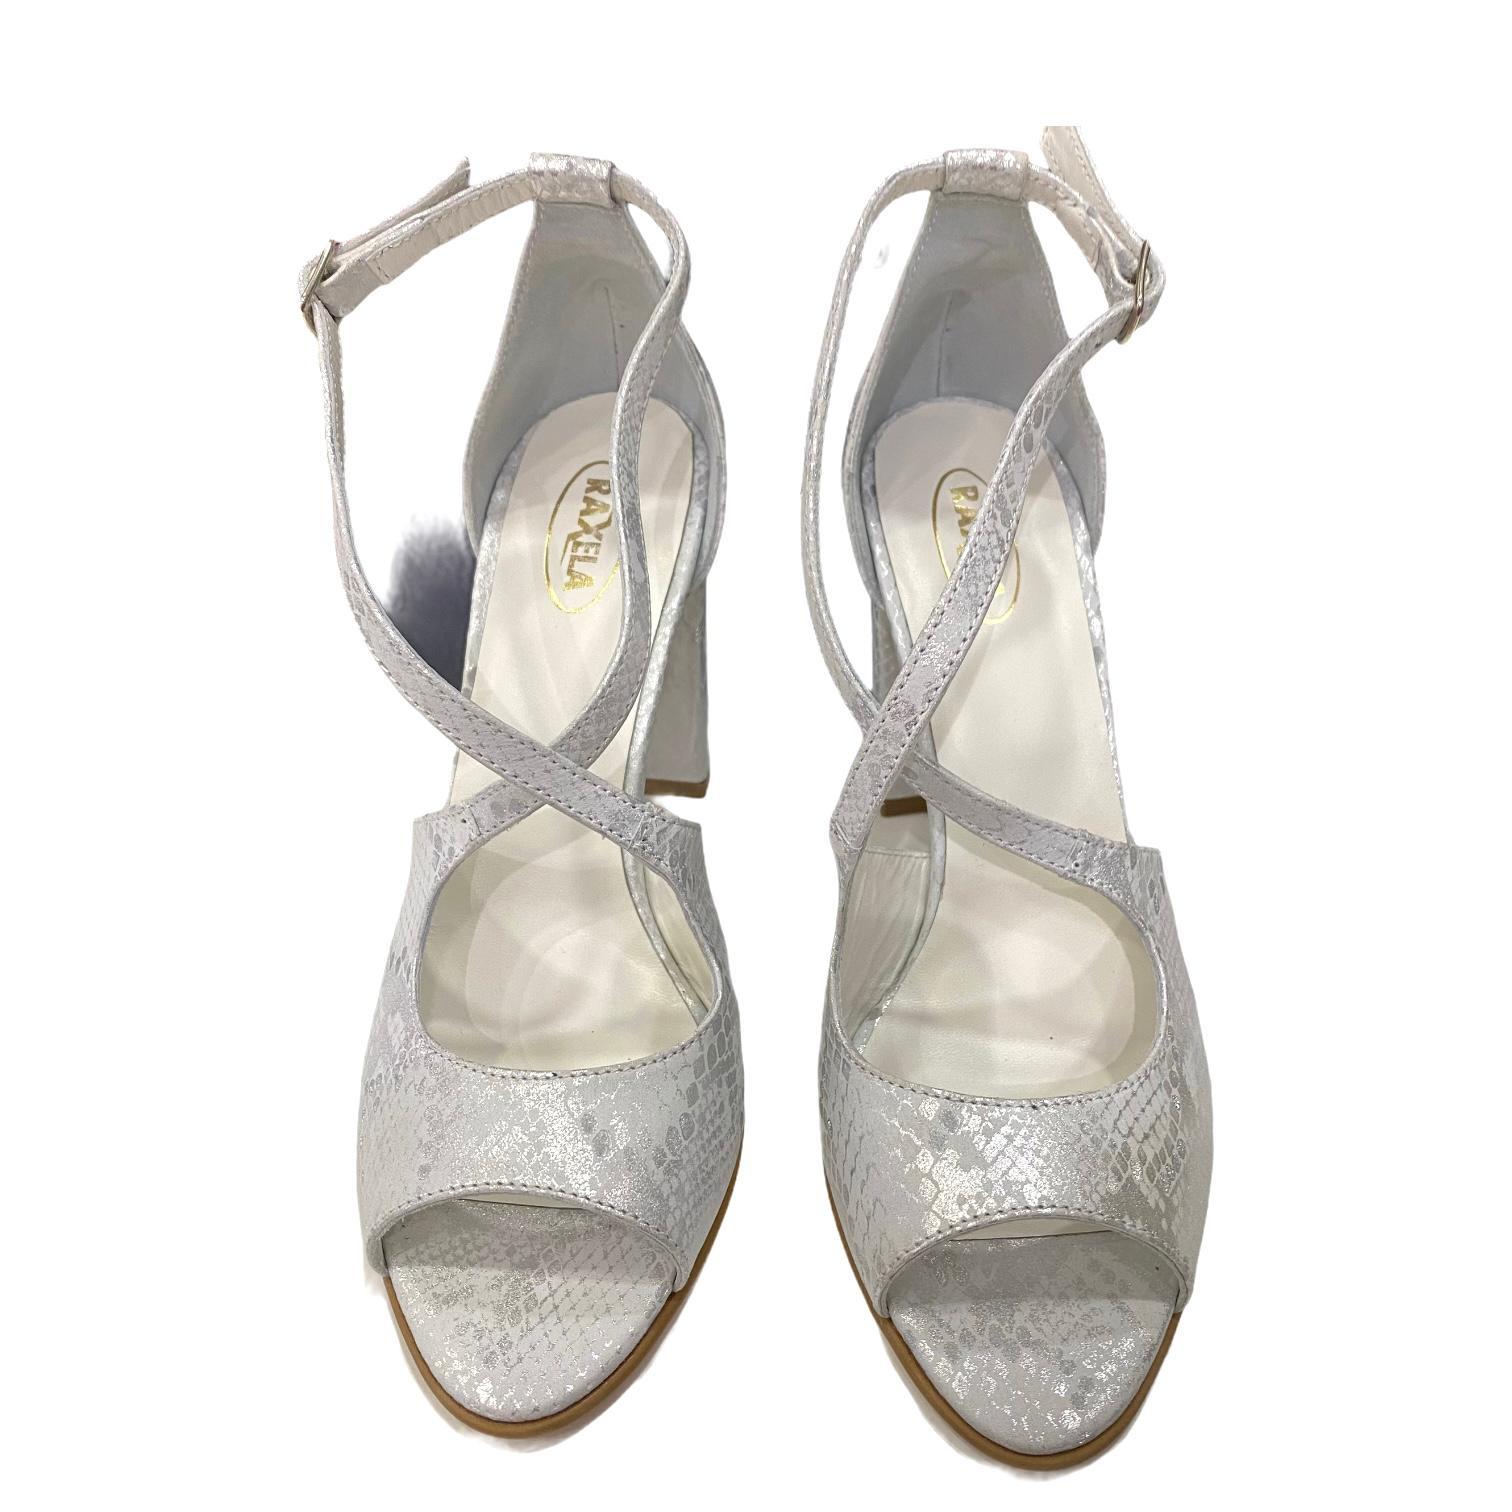 Sandale argintii cu imprimeu abstract si barete incrucisate